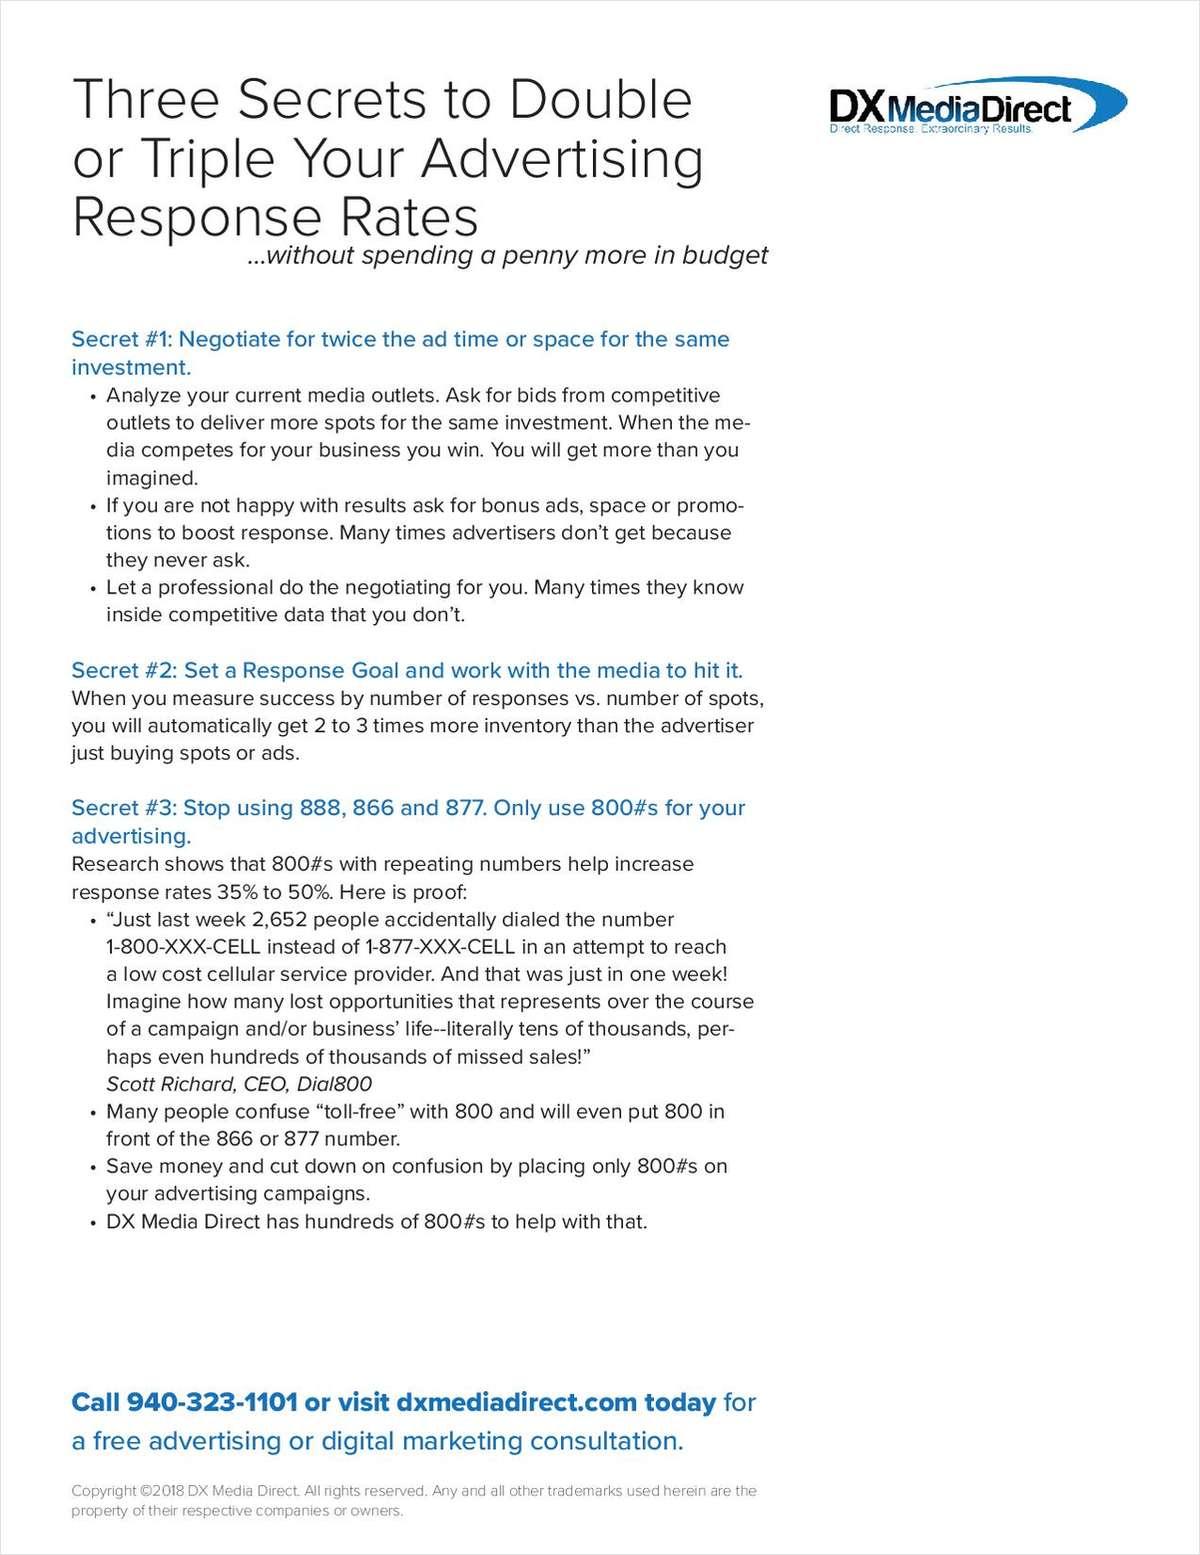 Three Secrets To Double Response Rates